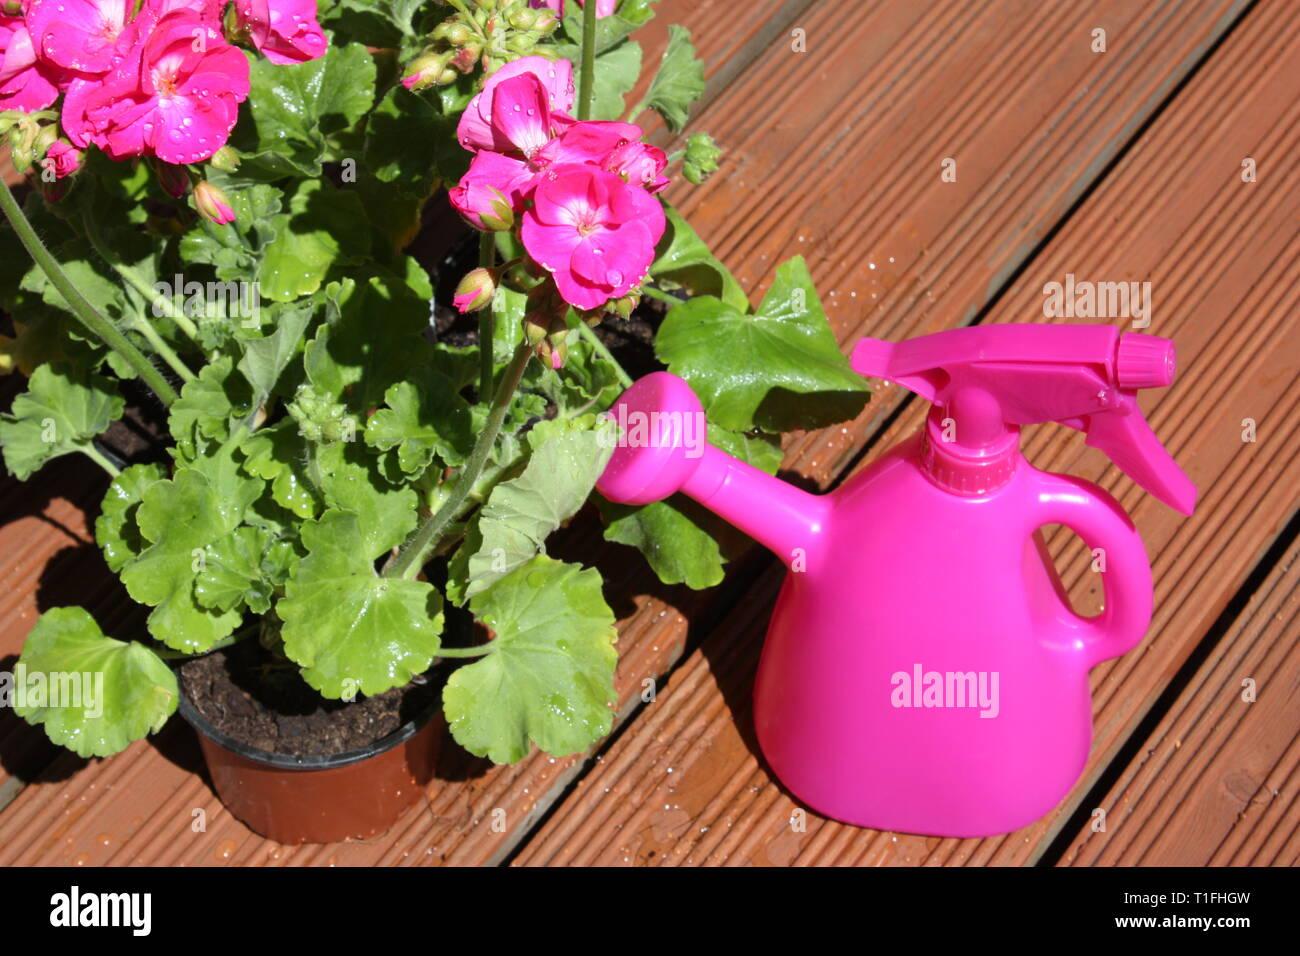 Pink geranium flowering plants with garden tools Stock Photo